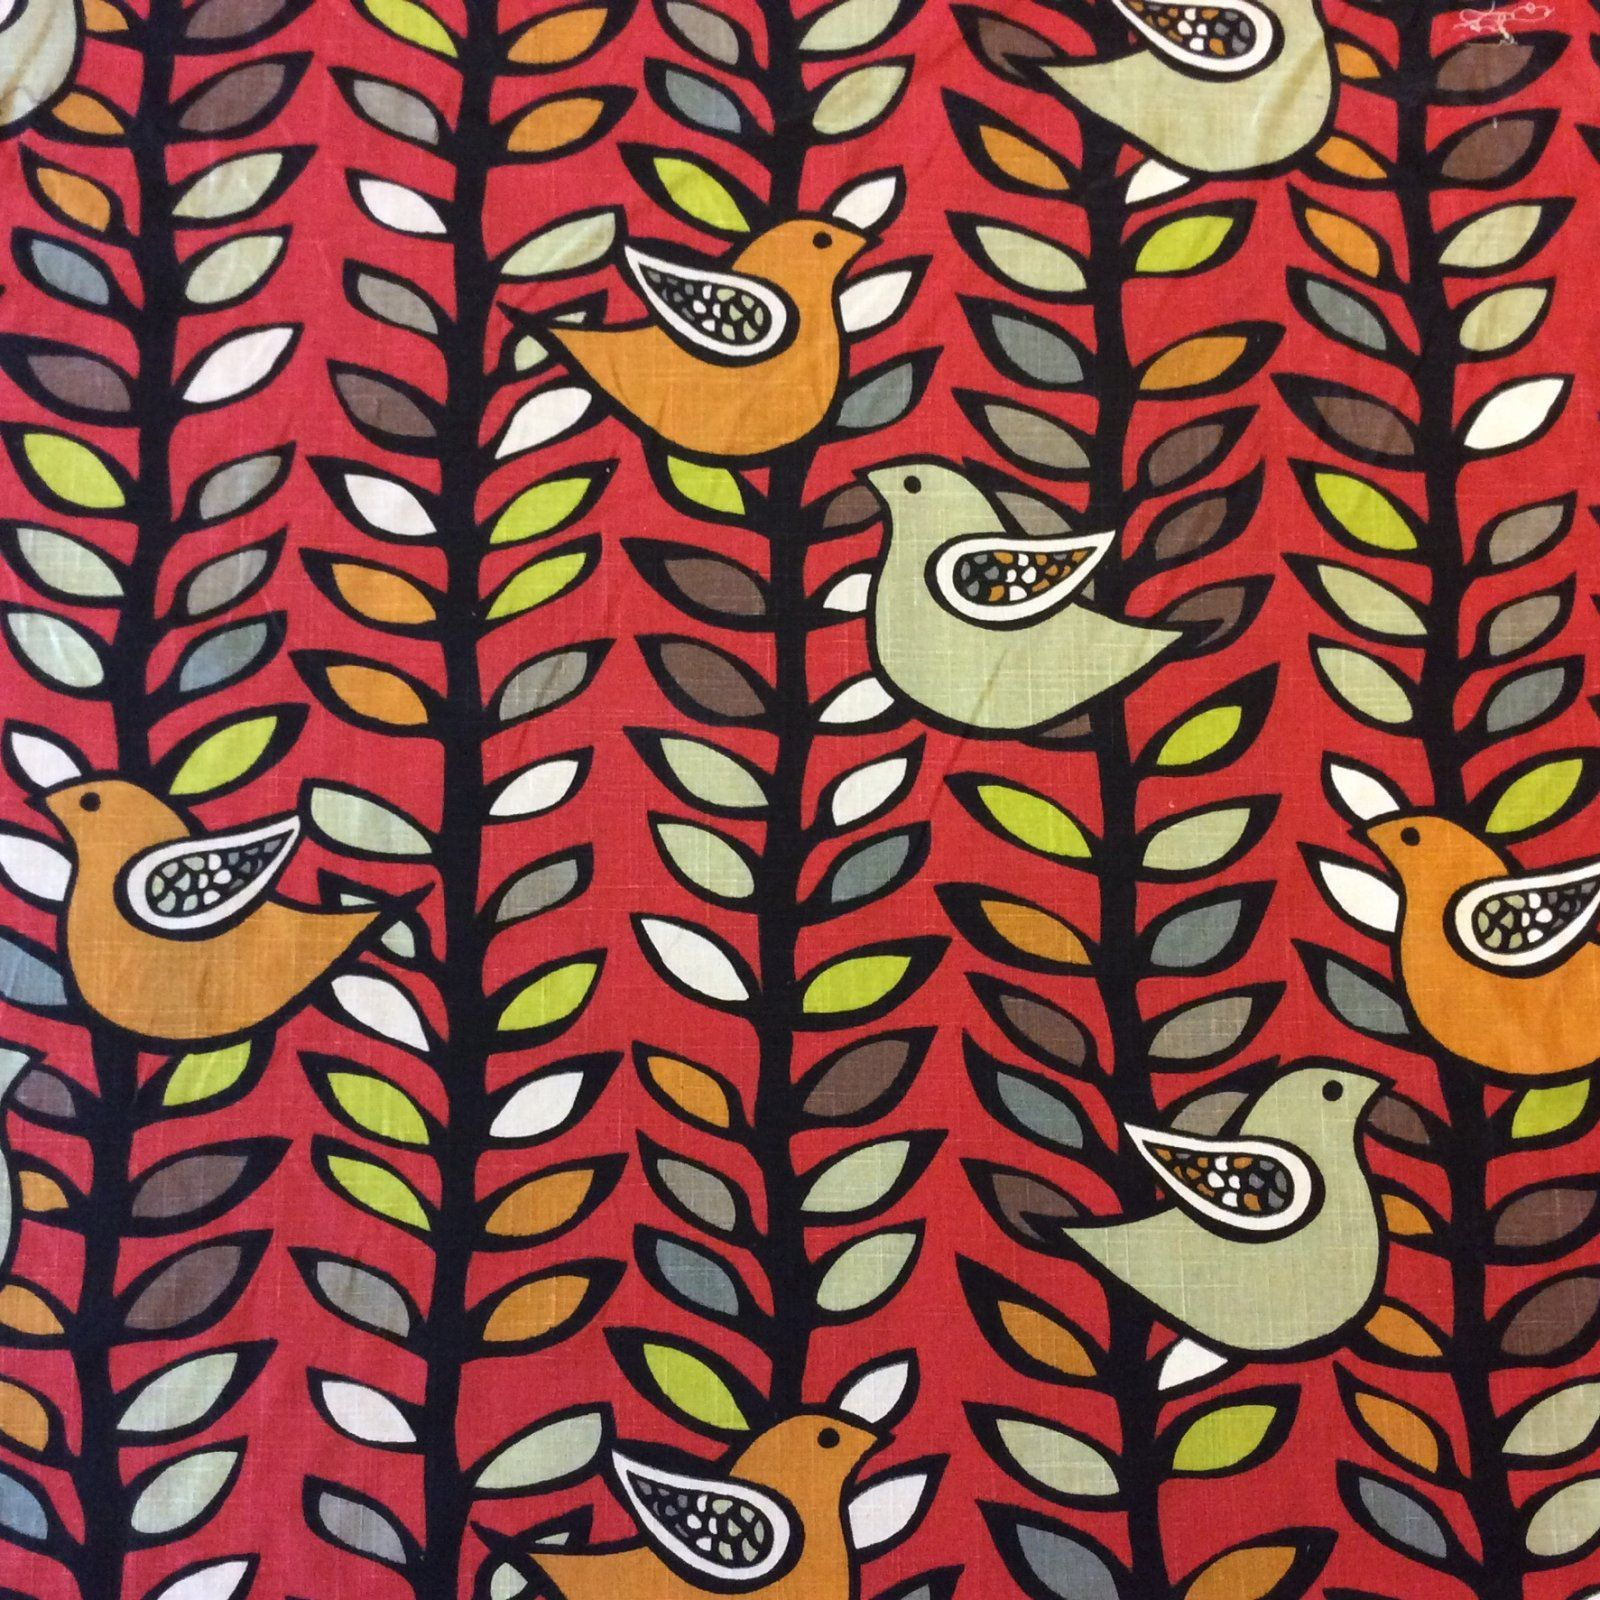 Scandinavian Mid Century Modern Style Graphic Bold Bird Fabric He Mid Century Modern Upholstery Fabric Modern Upholstery Fabric Scandinavian Mid Century Modern